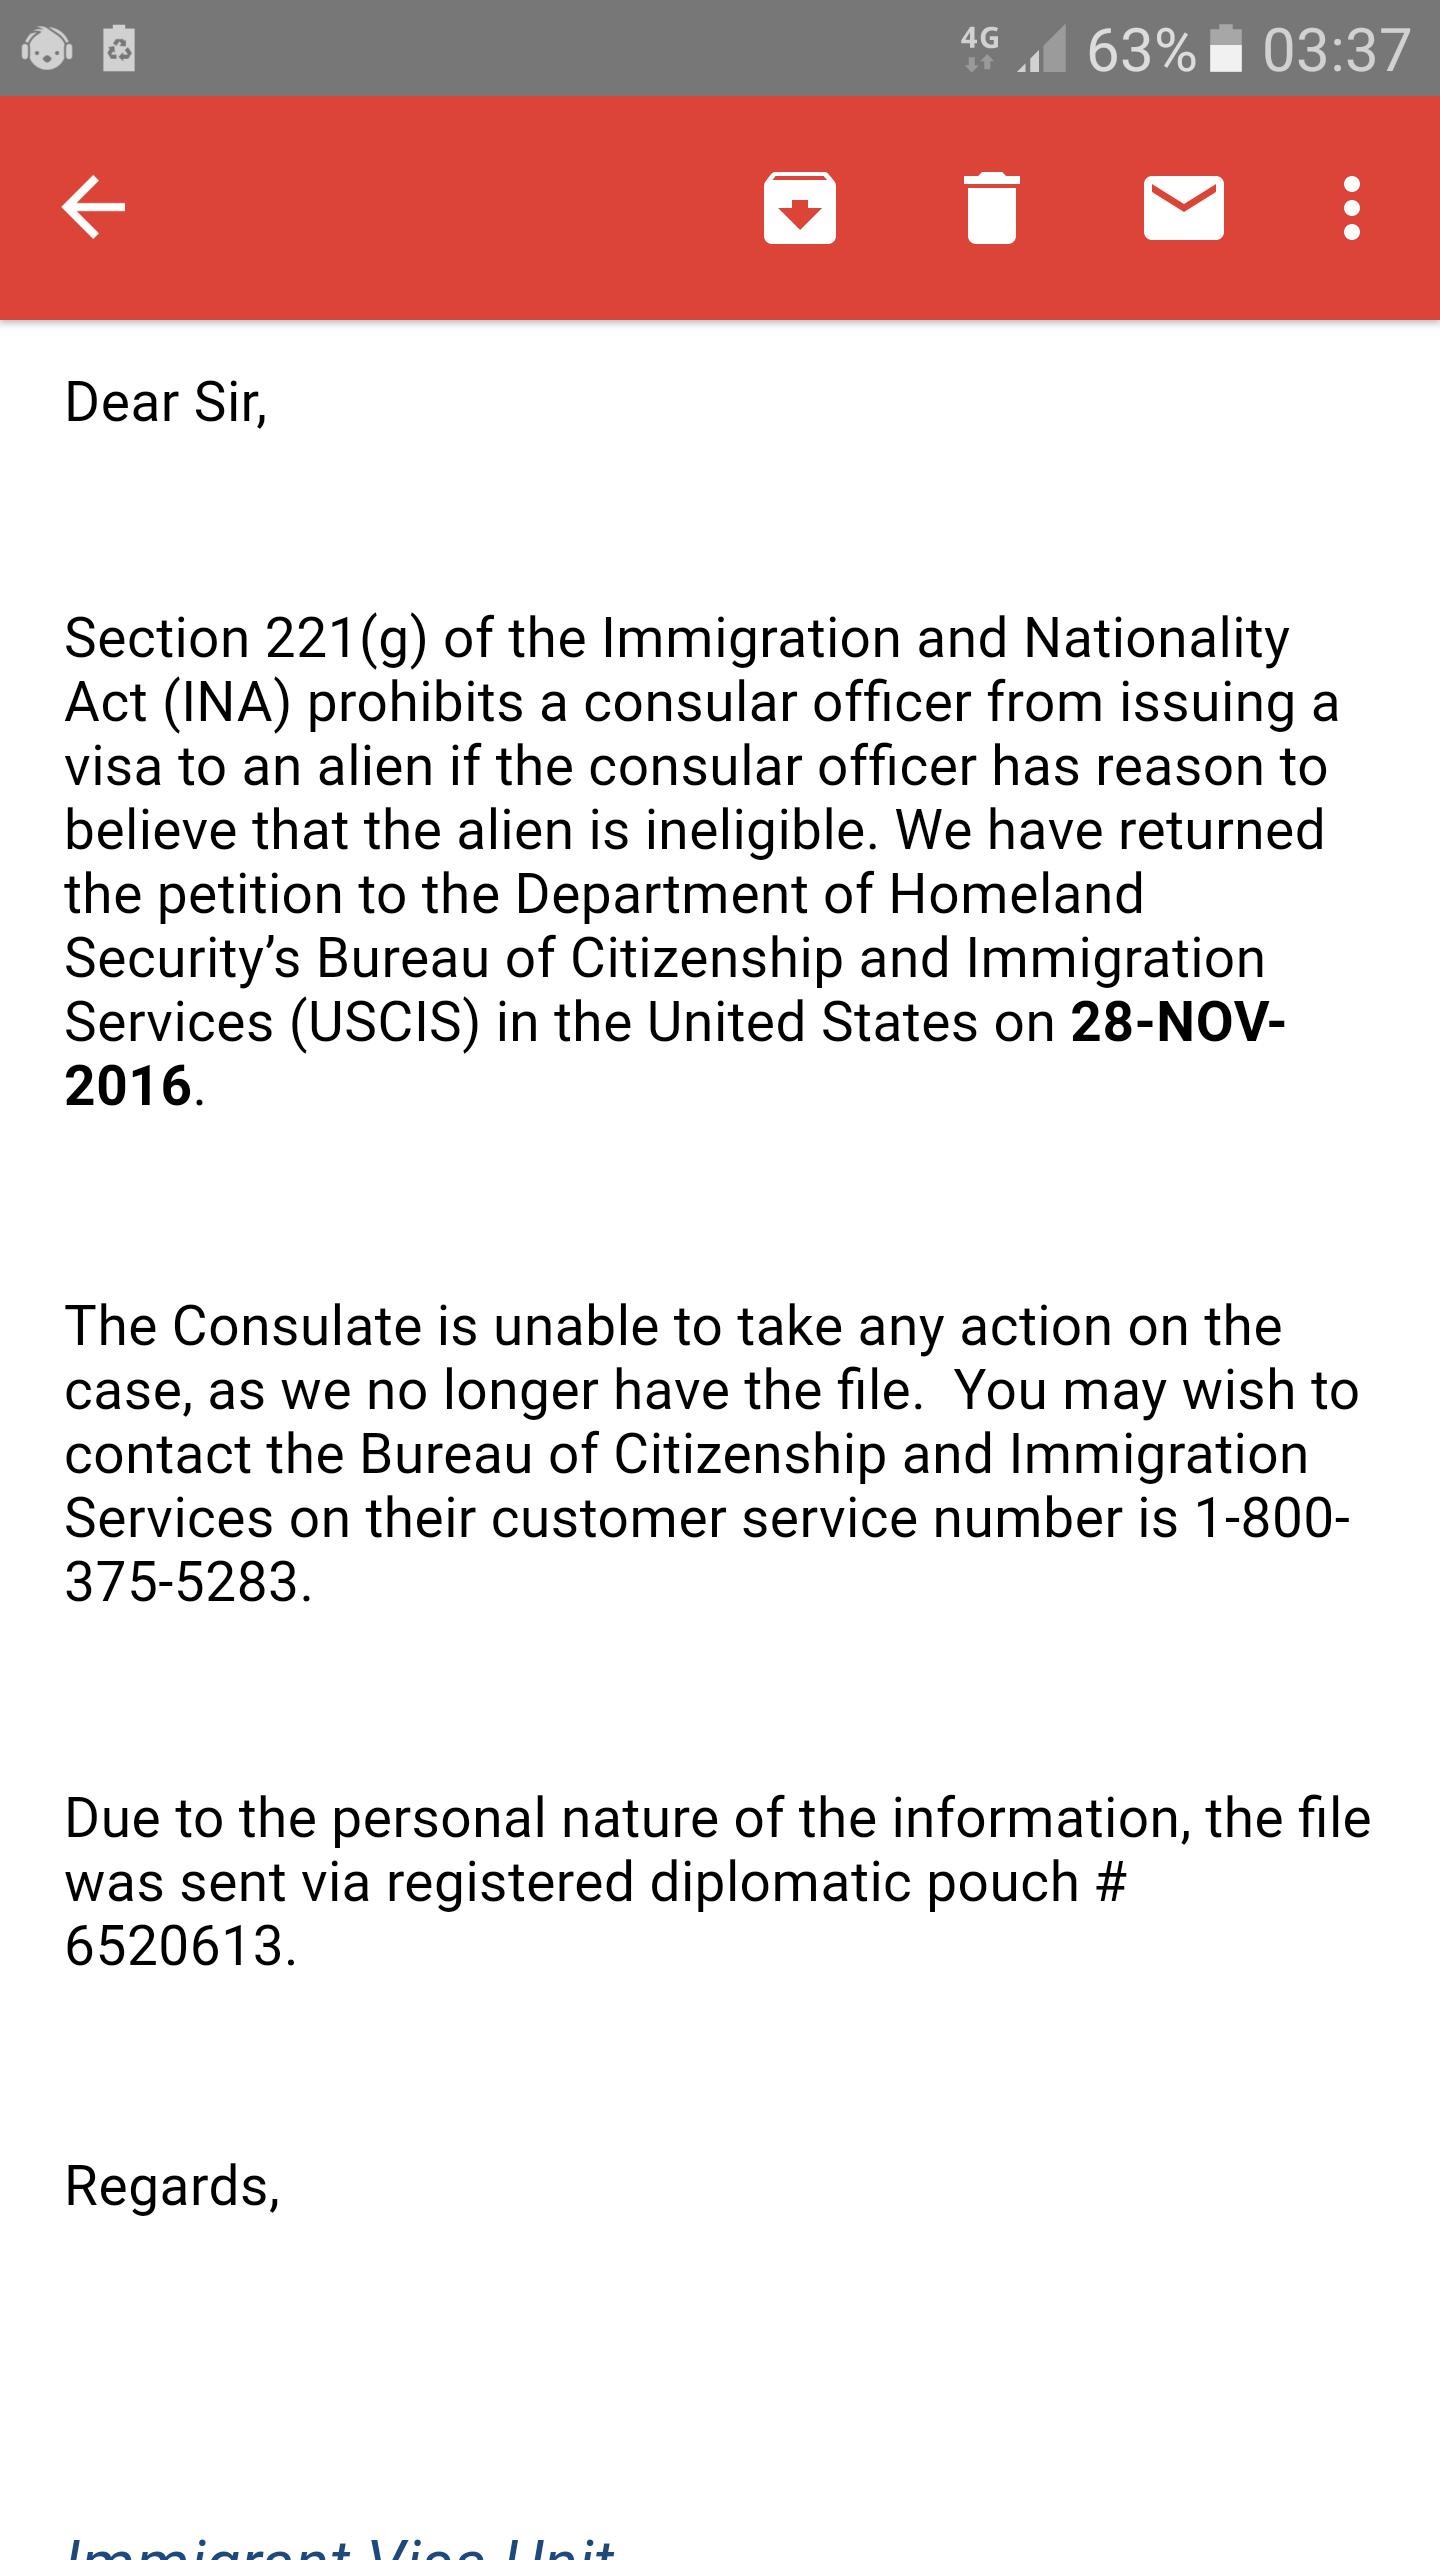 Returned to USCIS (221(g) - IR-1 / CR-1 Spouse Visa Case Filing and